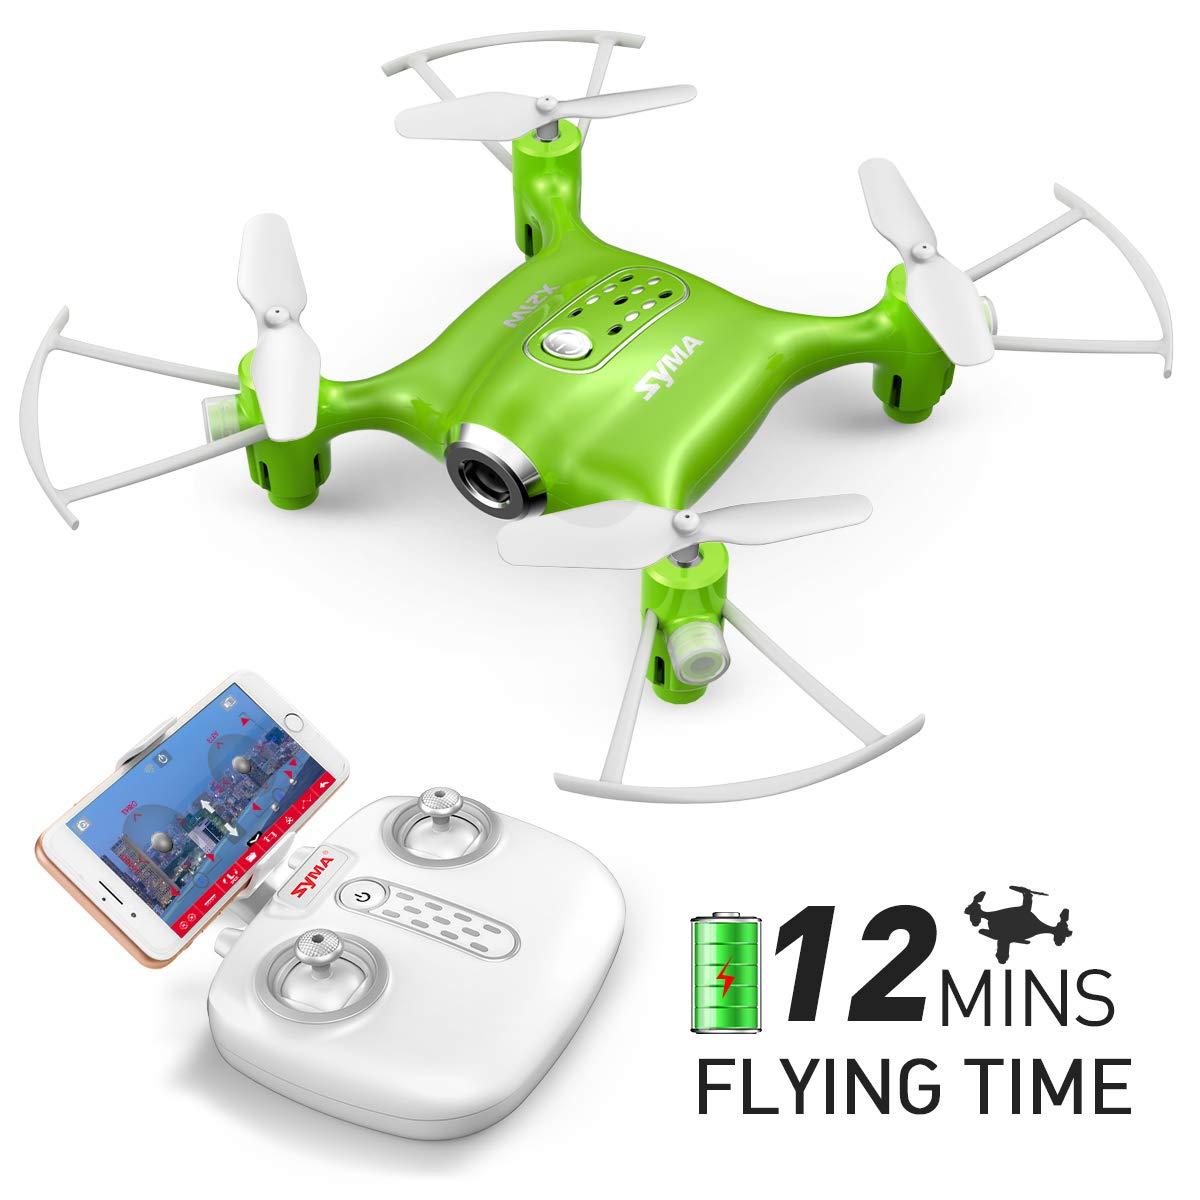 70% off Mini Drone with Camera Syma X21W RC Quadcopter for Children